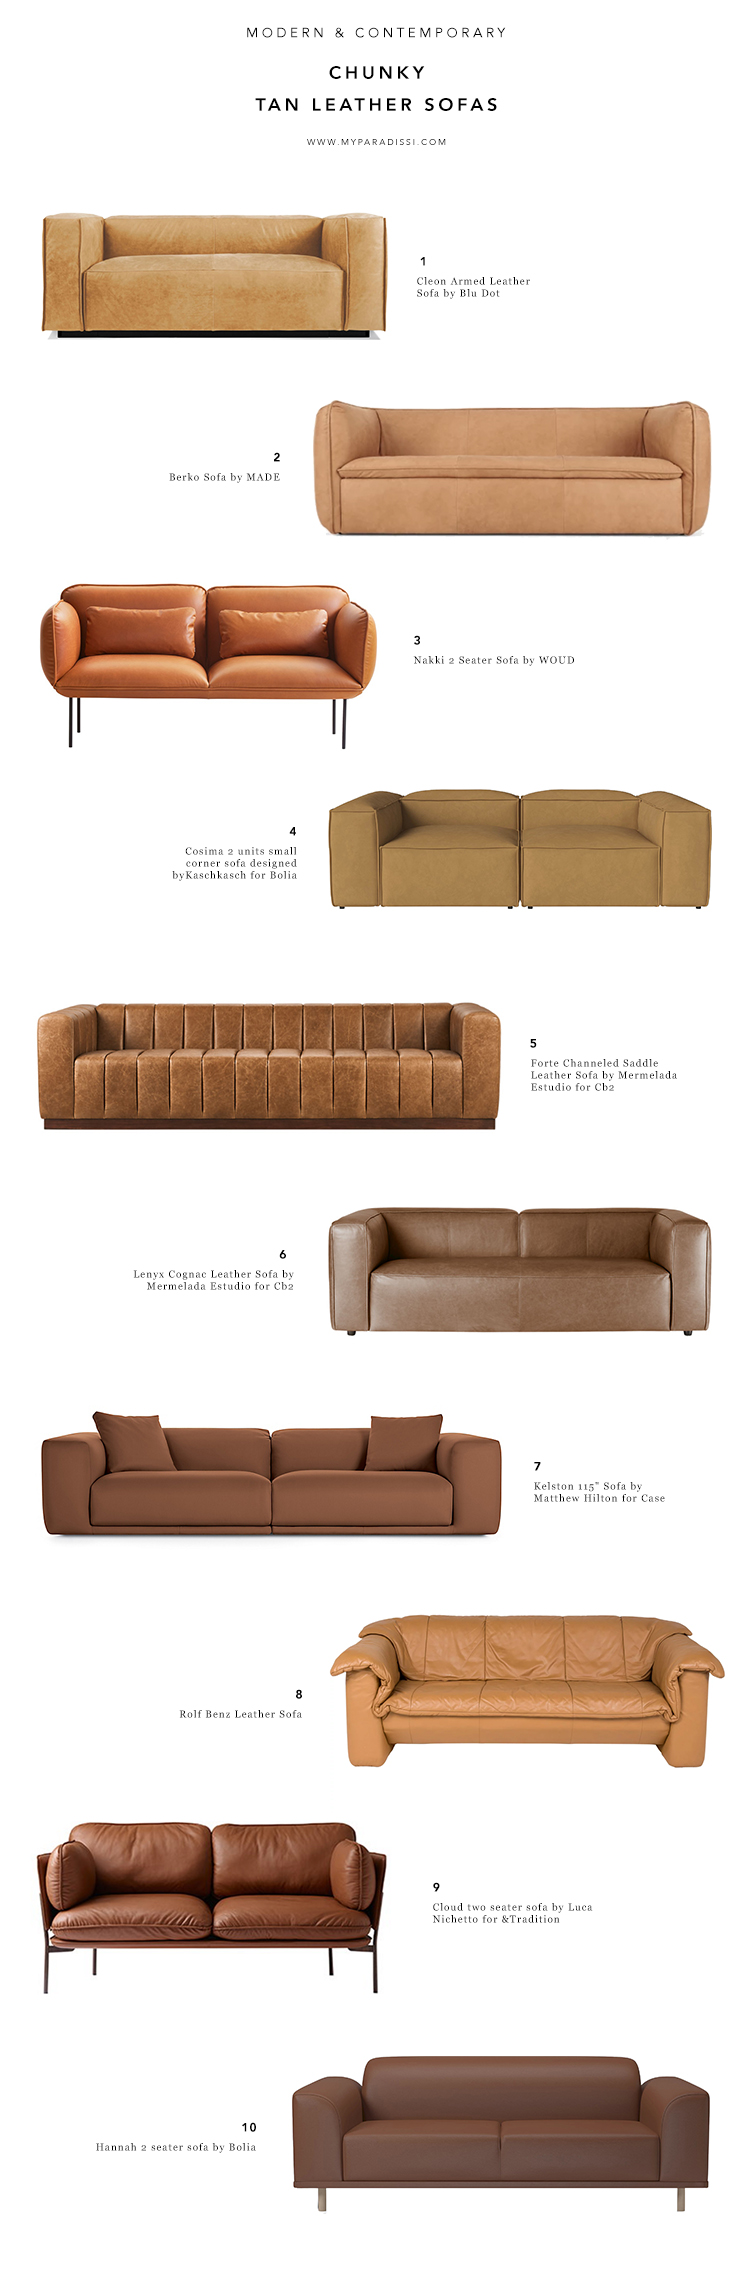 Tremendous 10 Best Chunky Tan Leather Sofas My Paradissi Lamtechconsult Wood Chair Design Ideas Lamtechconsultcom